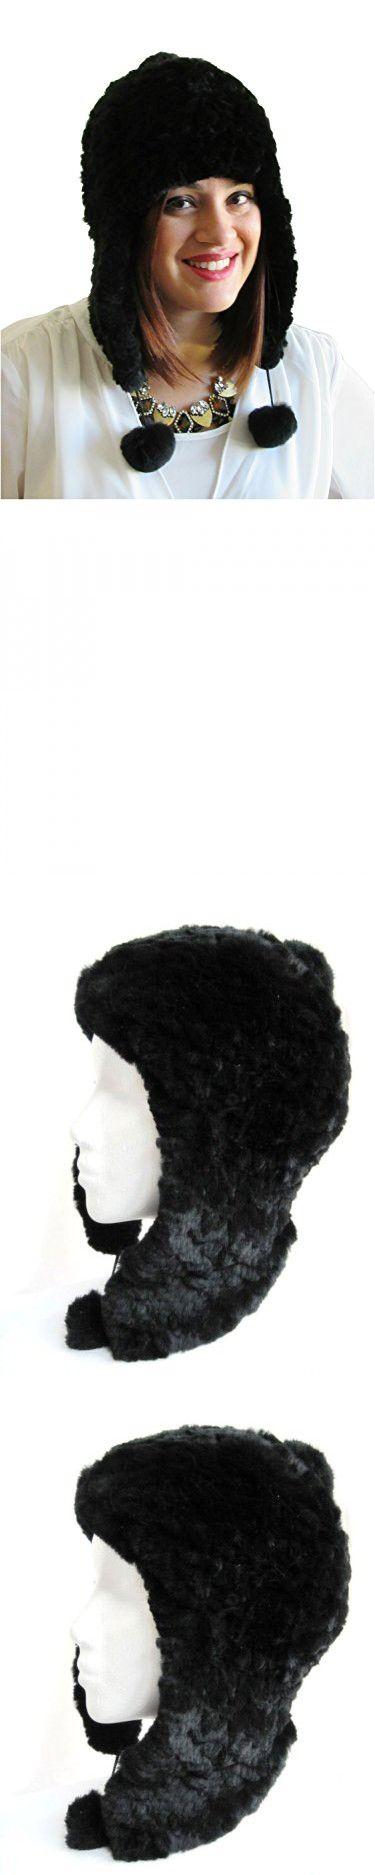 Unisex Knit Black Rex Rabbit Pom Poms Trapper Hat